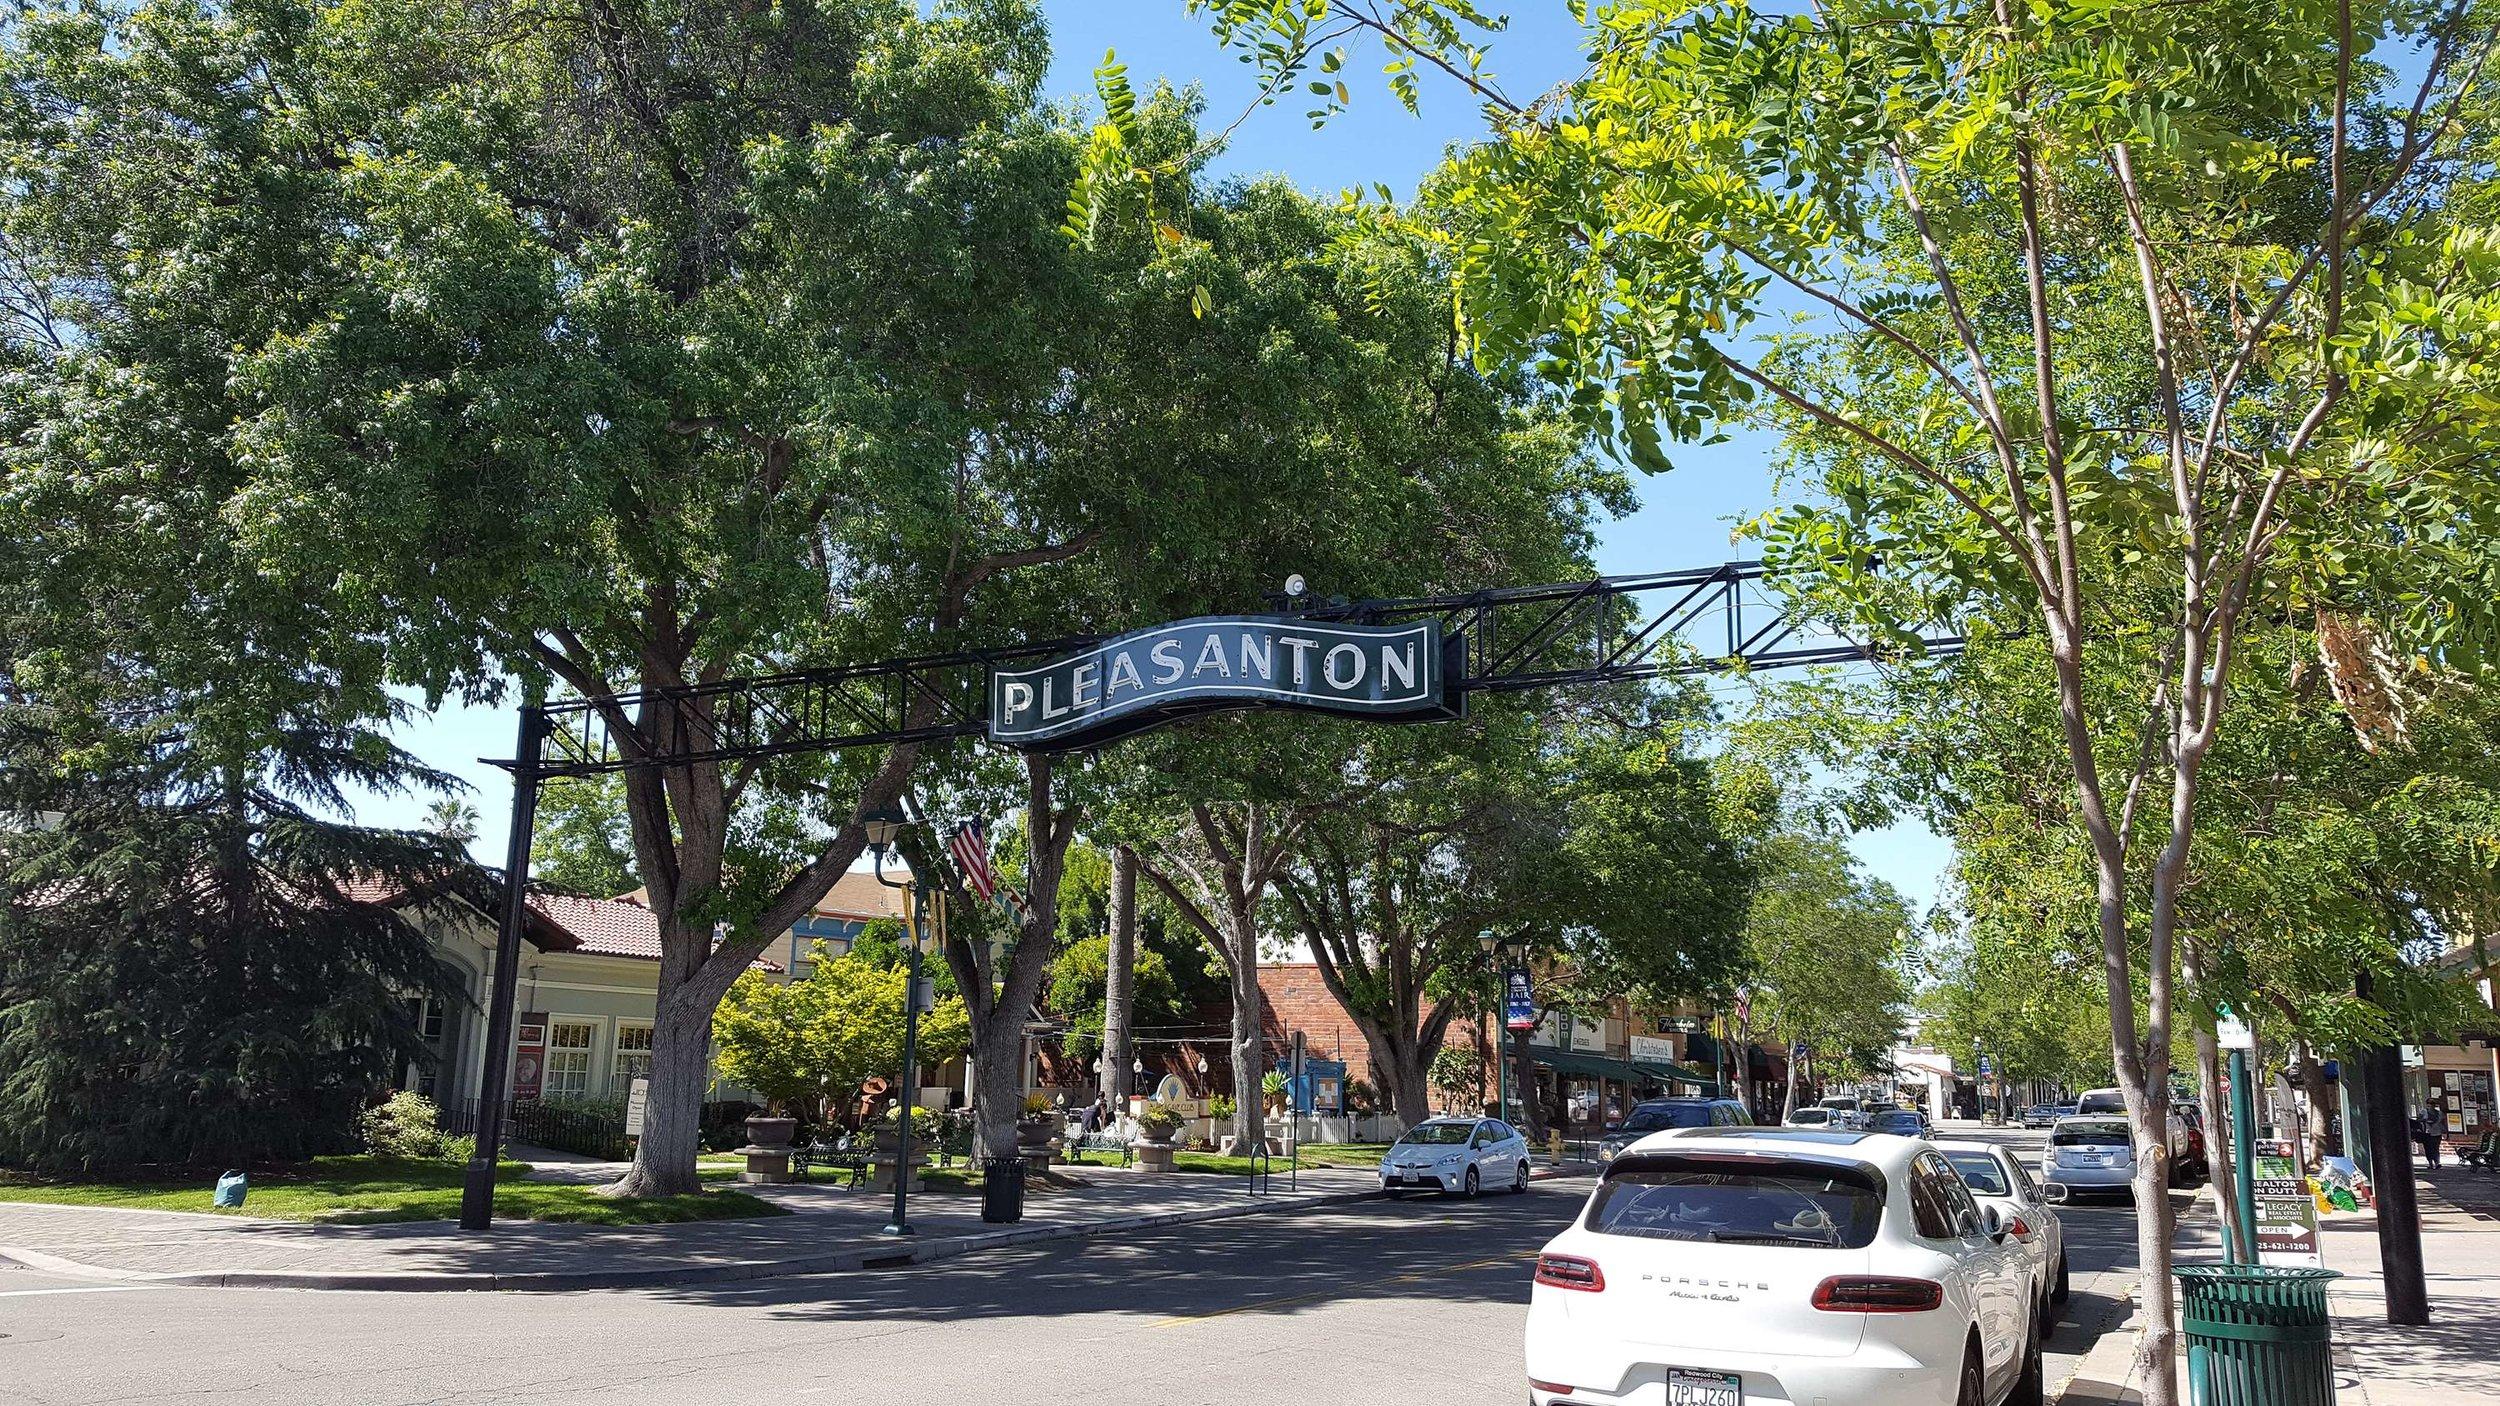 73173358_3074505-california_main-street_pleasanton.jpg